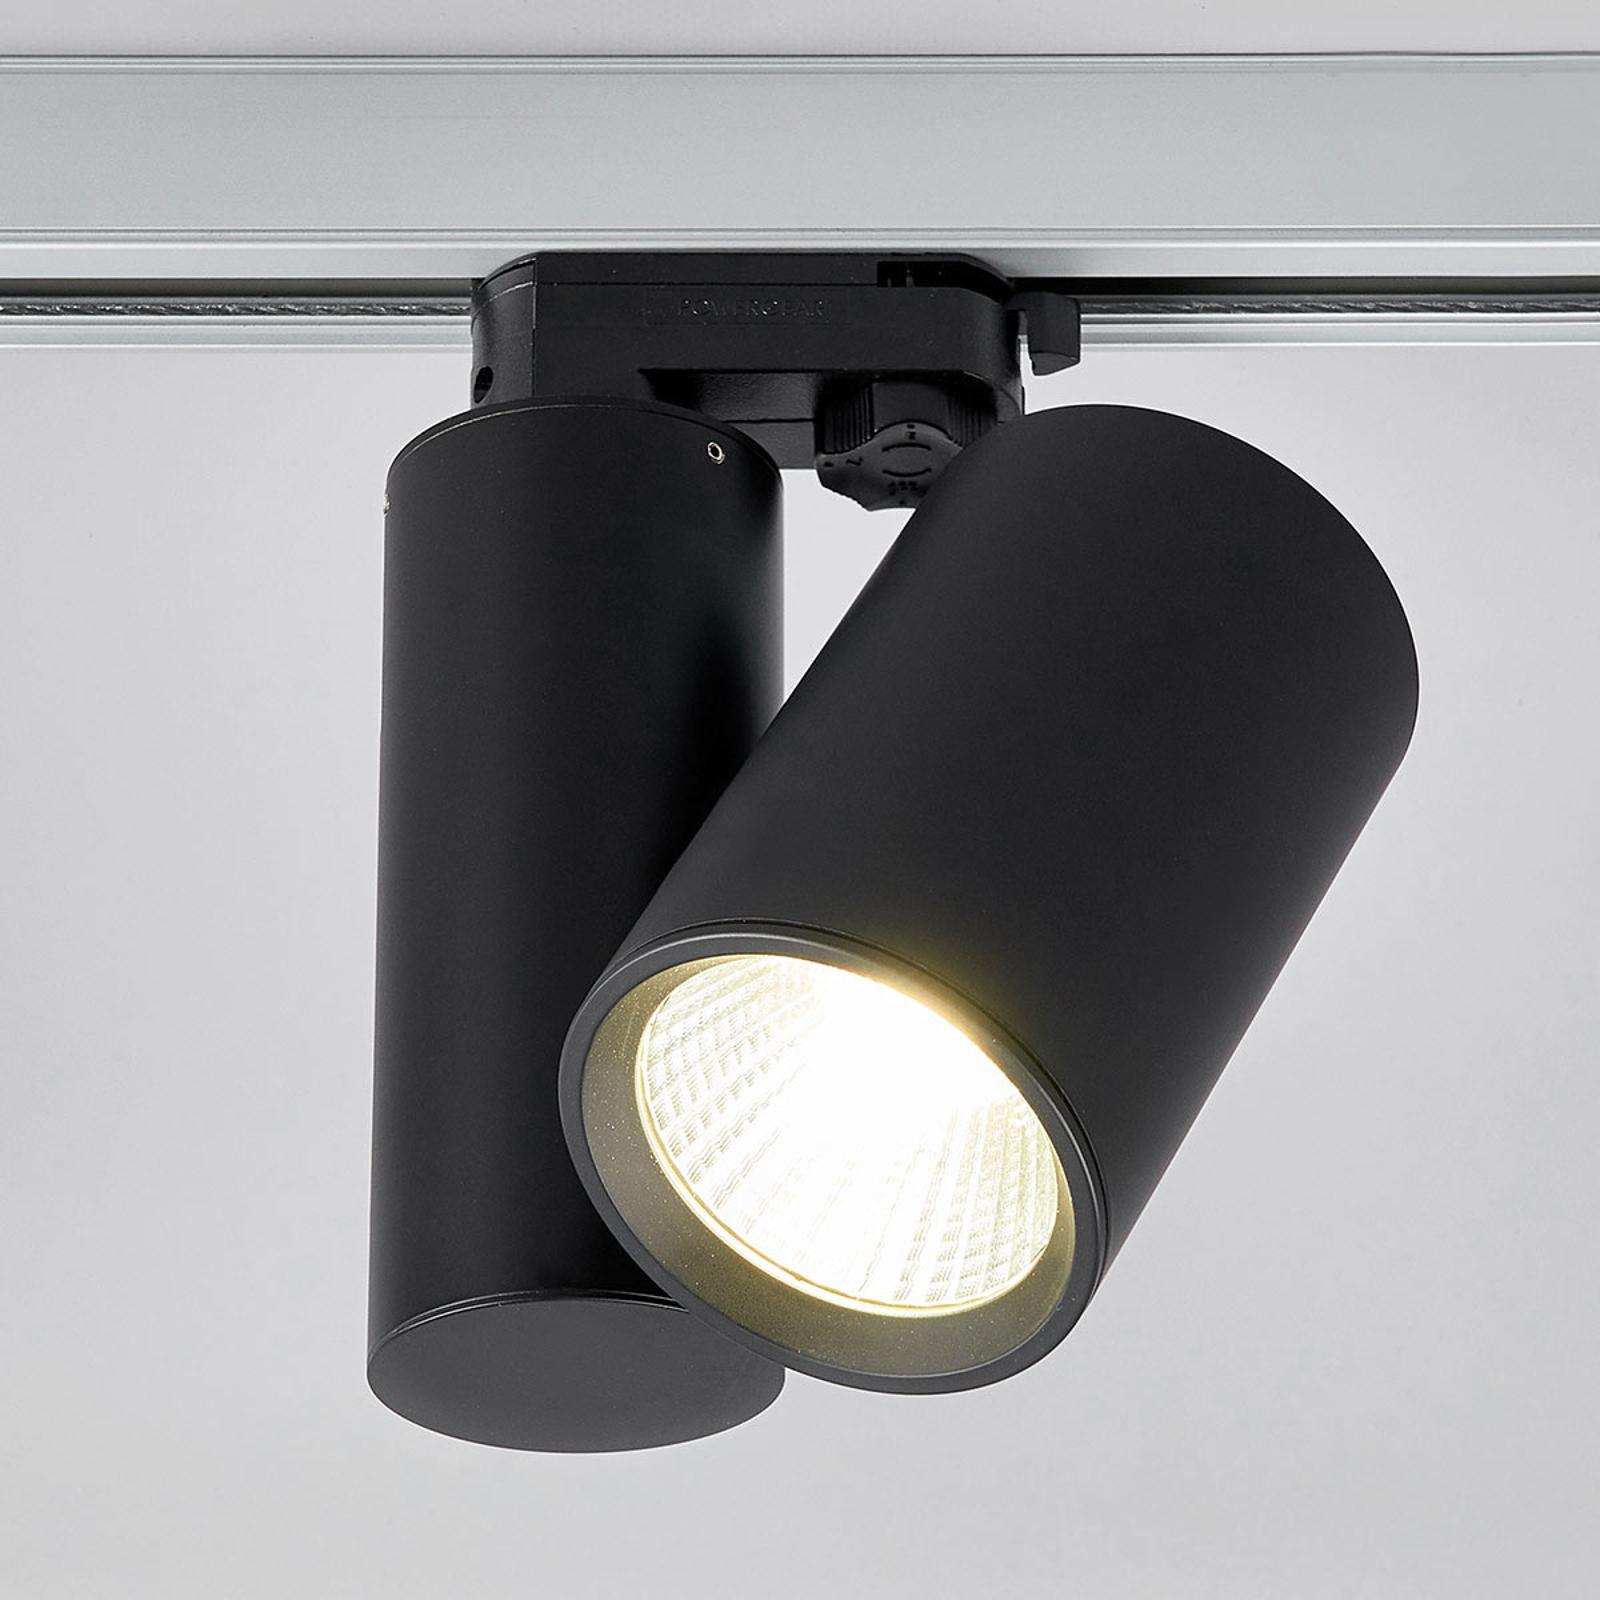 Zwarte LED spot Giol voor railsysteem